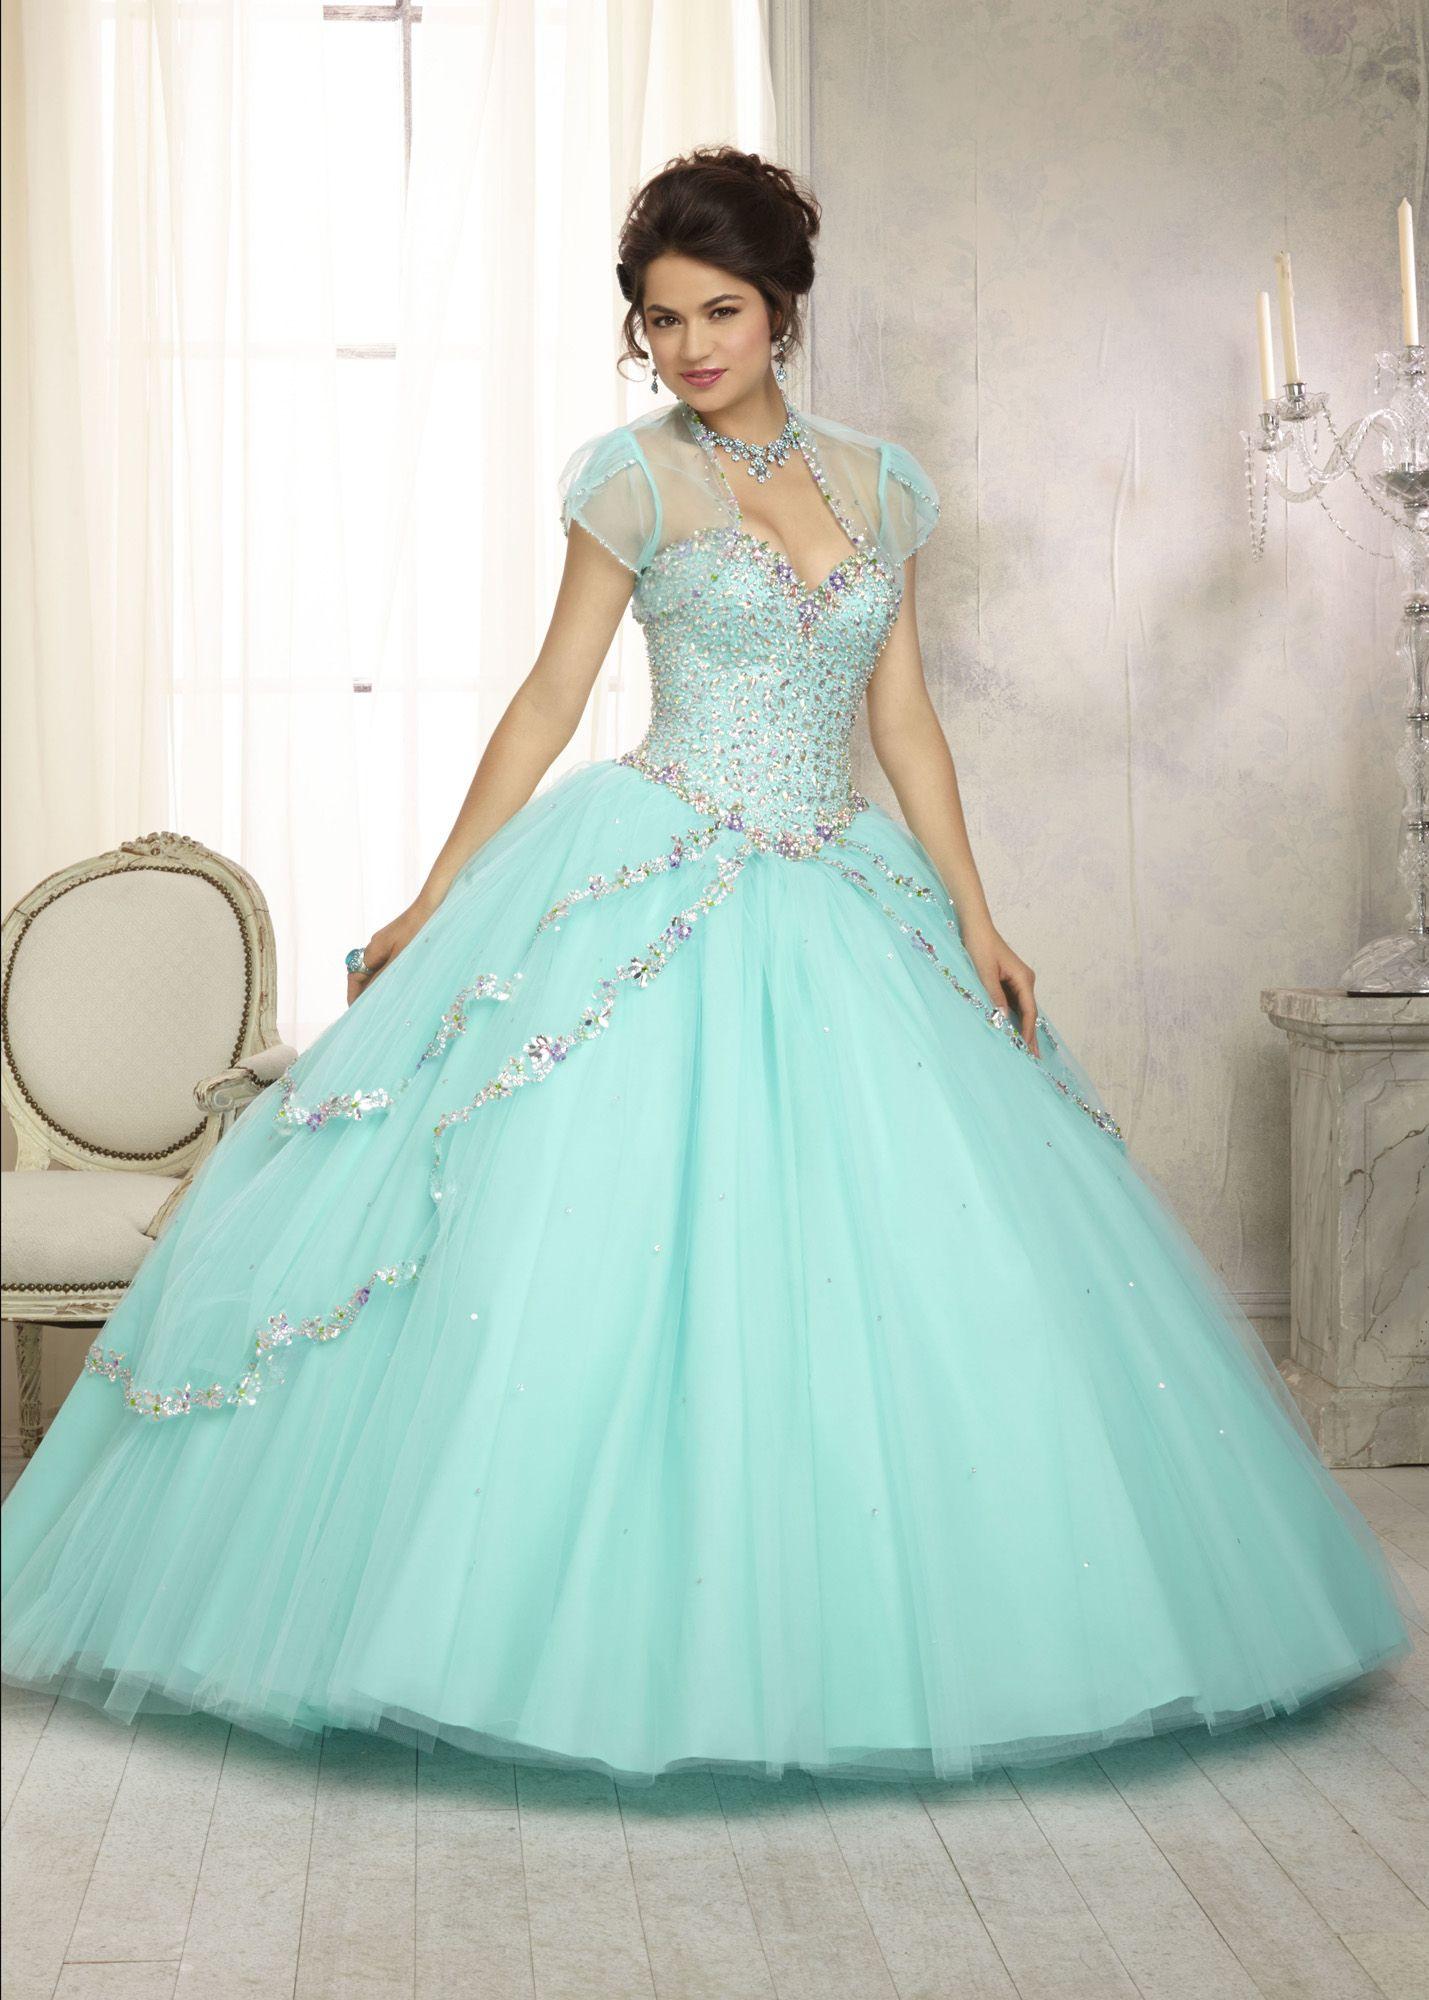 Vizcaya 88091 - Aqua Beaded Strapless Quinceanera Prom Dresses ...